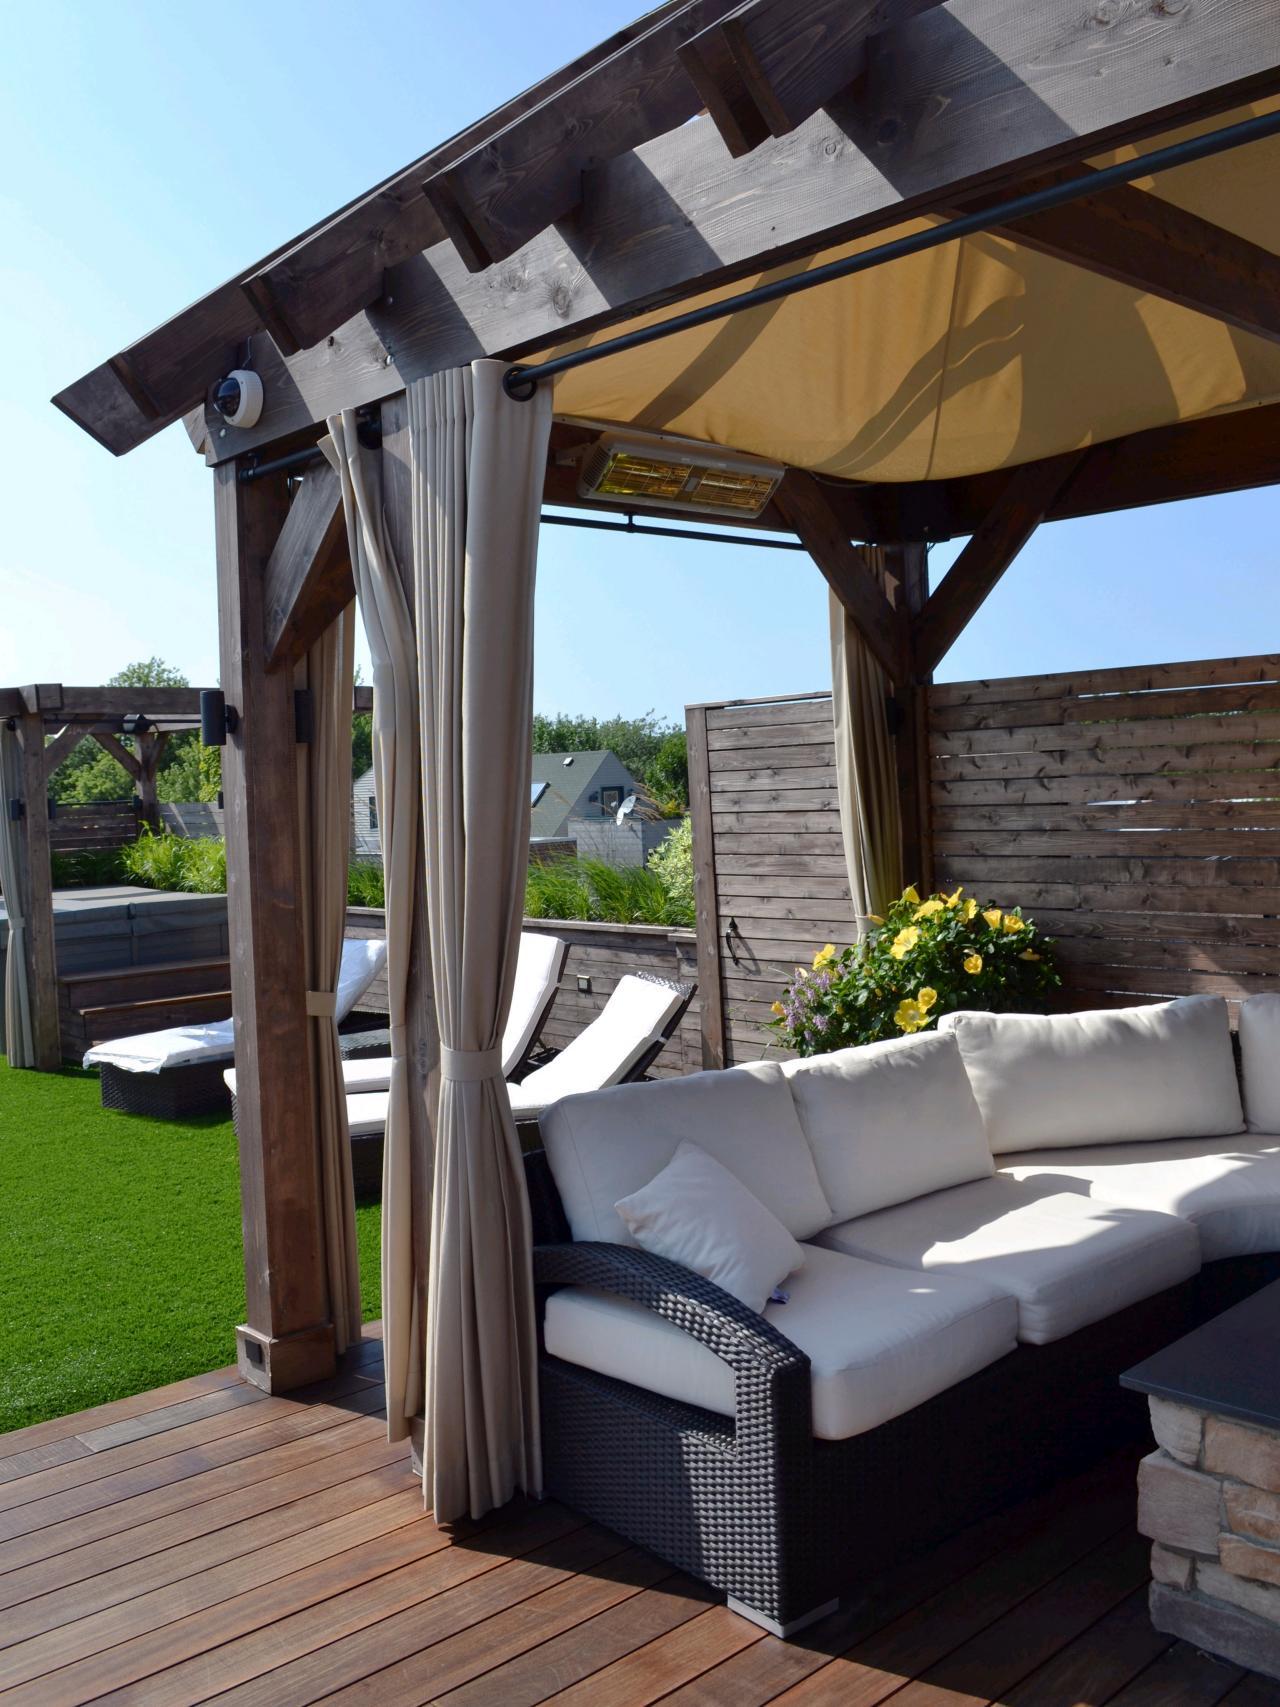 dp-adam-miller_contemporary-outdoor-draperies_s3x4-jpg-rend-hgtvcom-1280-1707